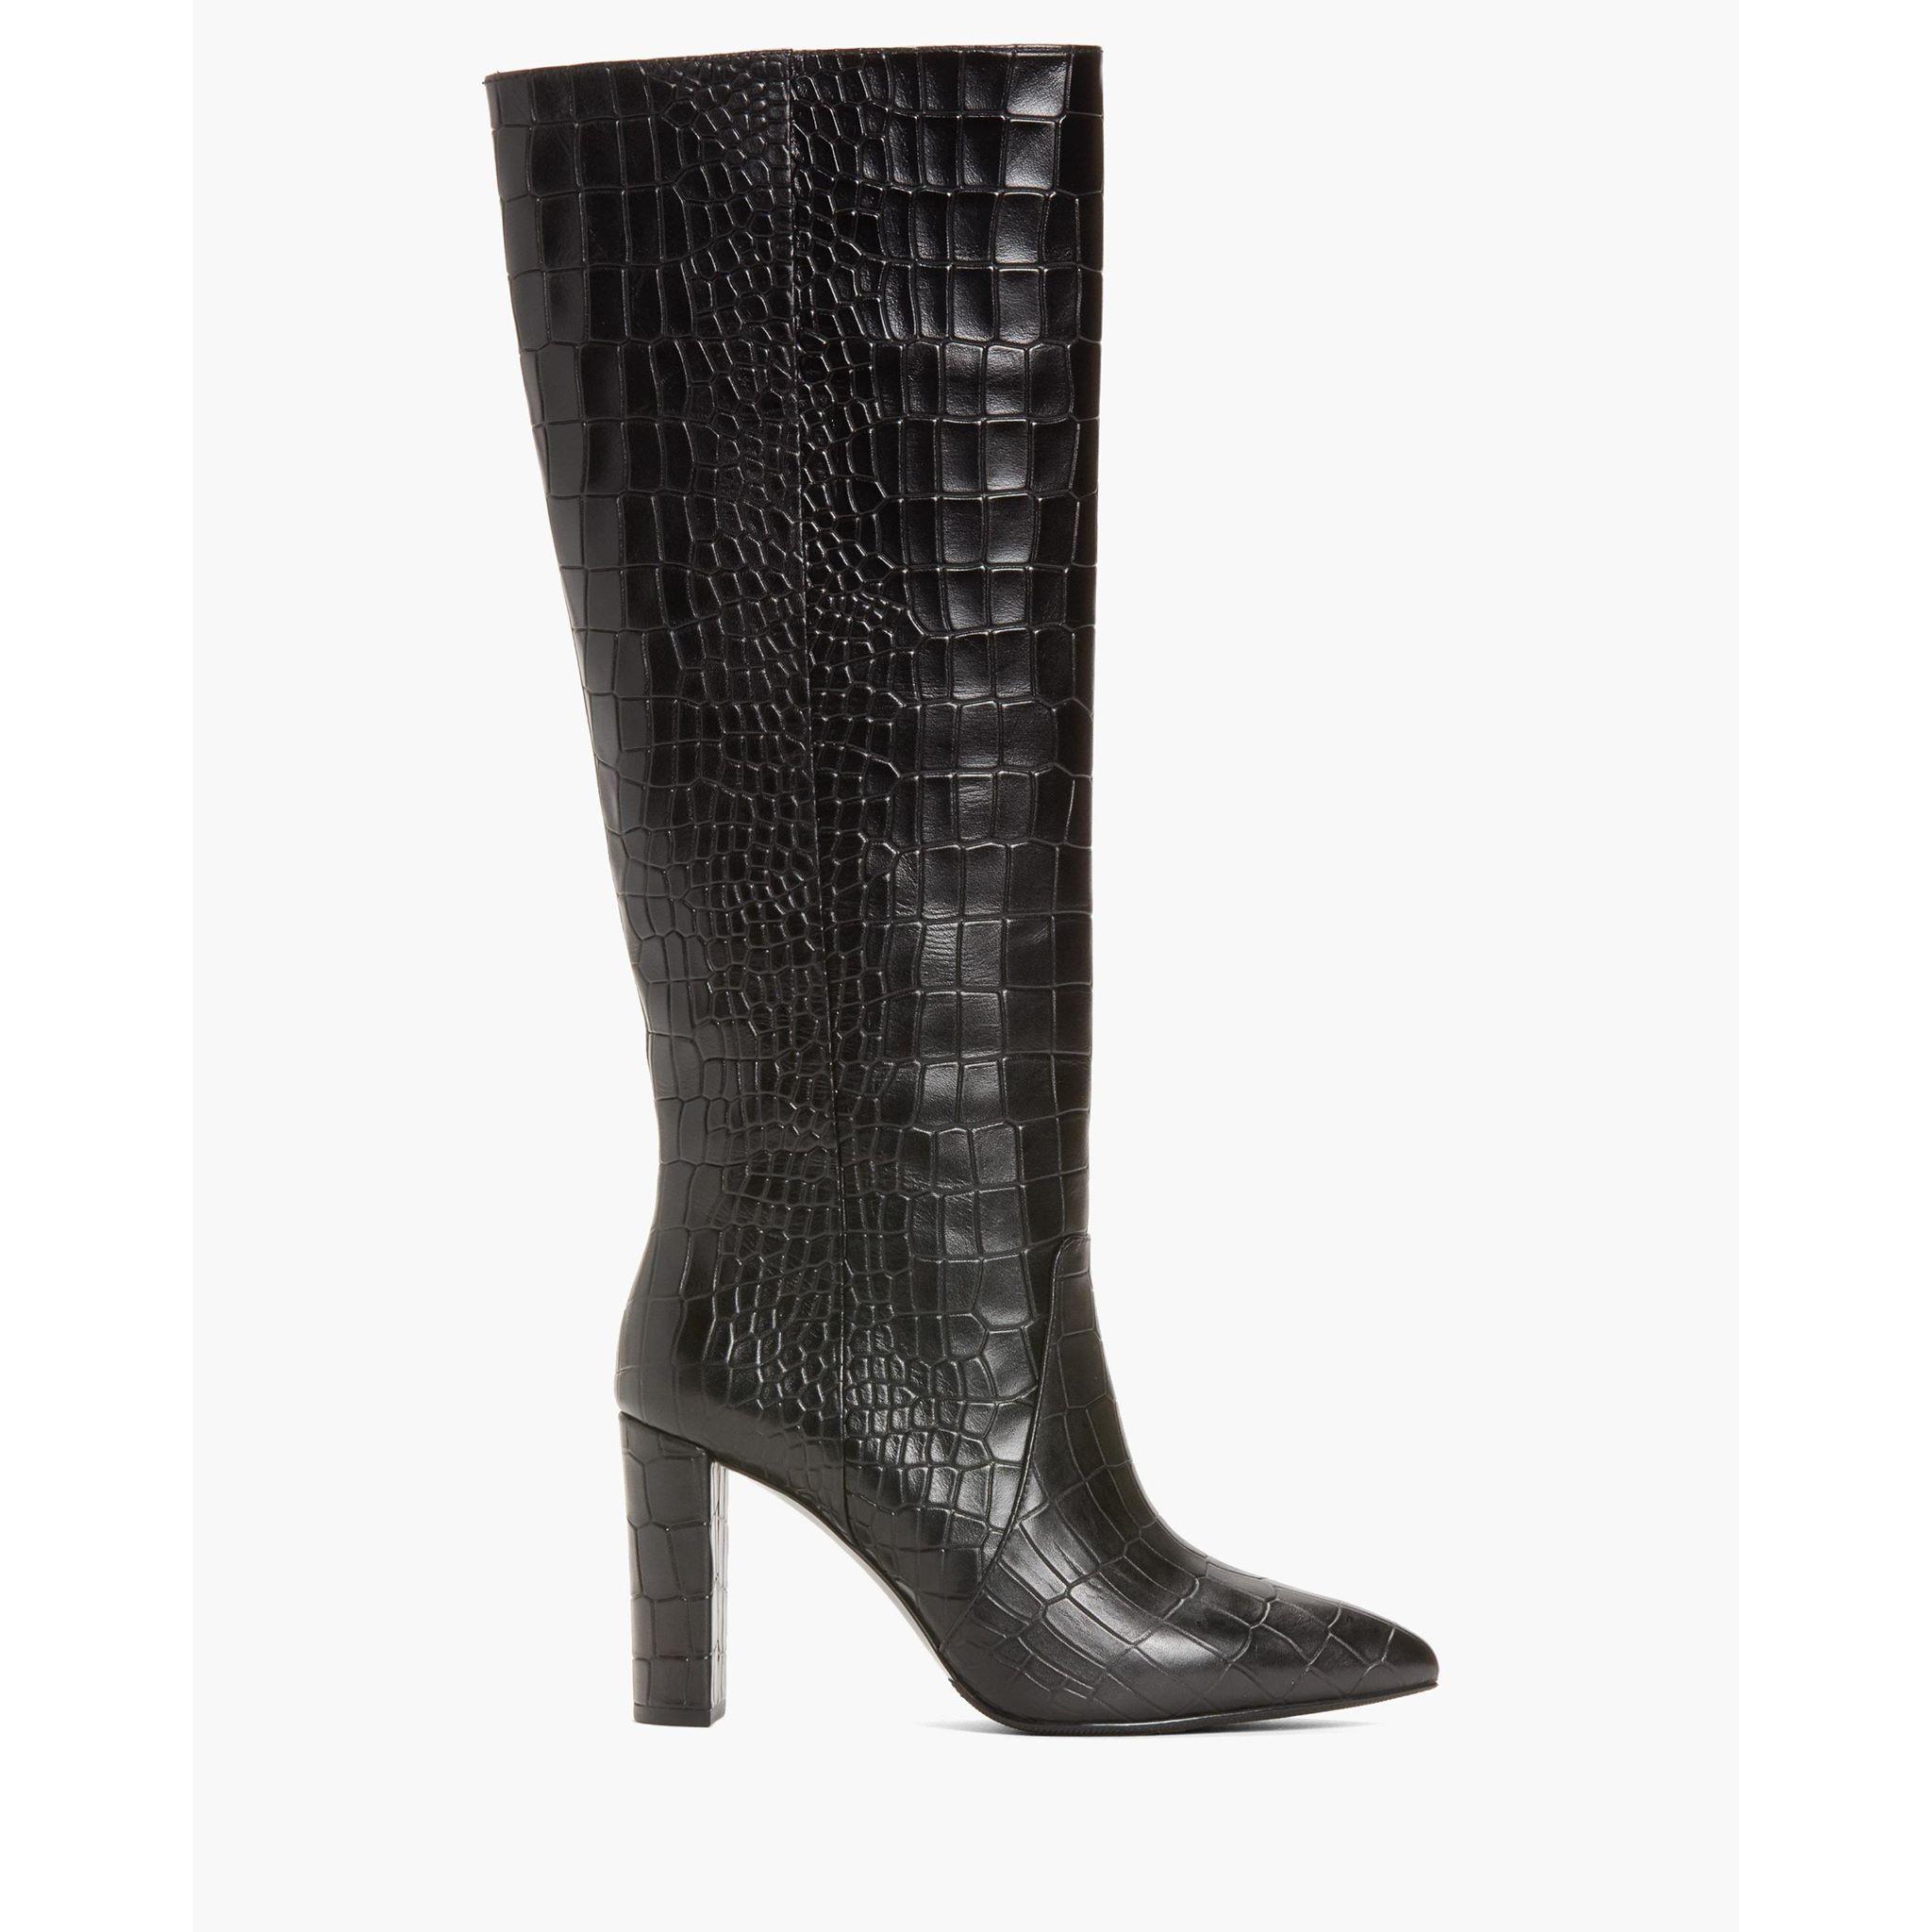 PAIGE Women's Carmen Boot - Black Embossed Croc Leather | High